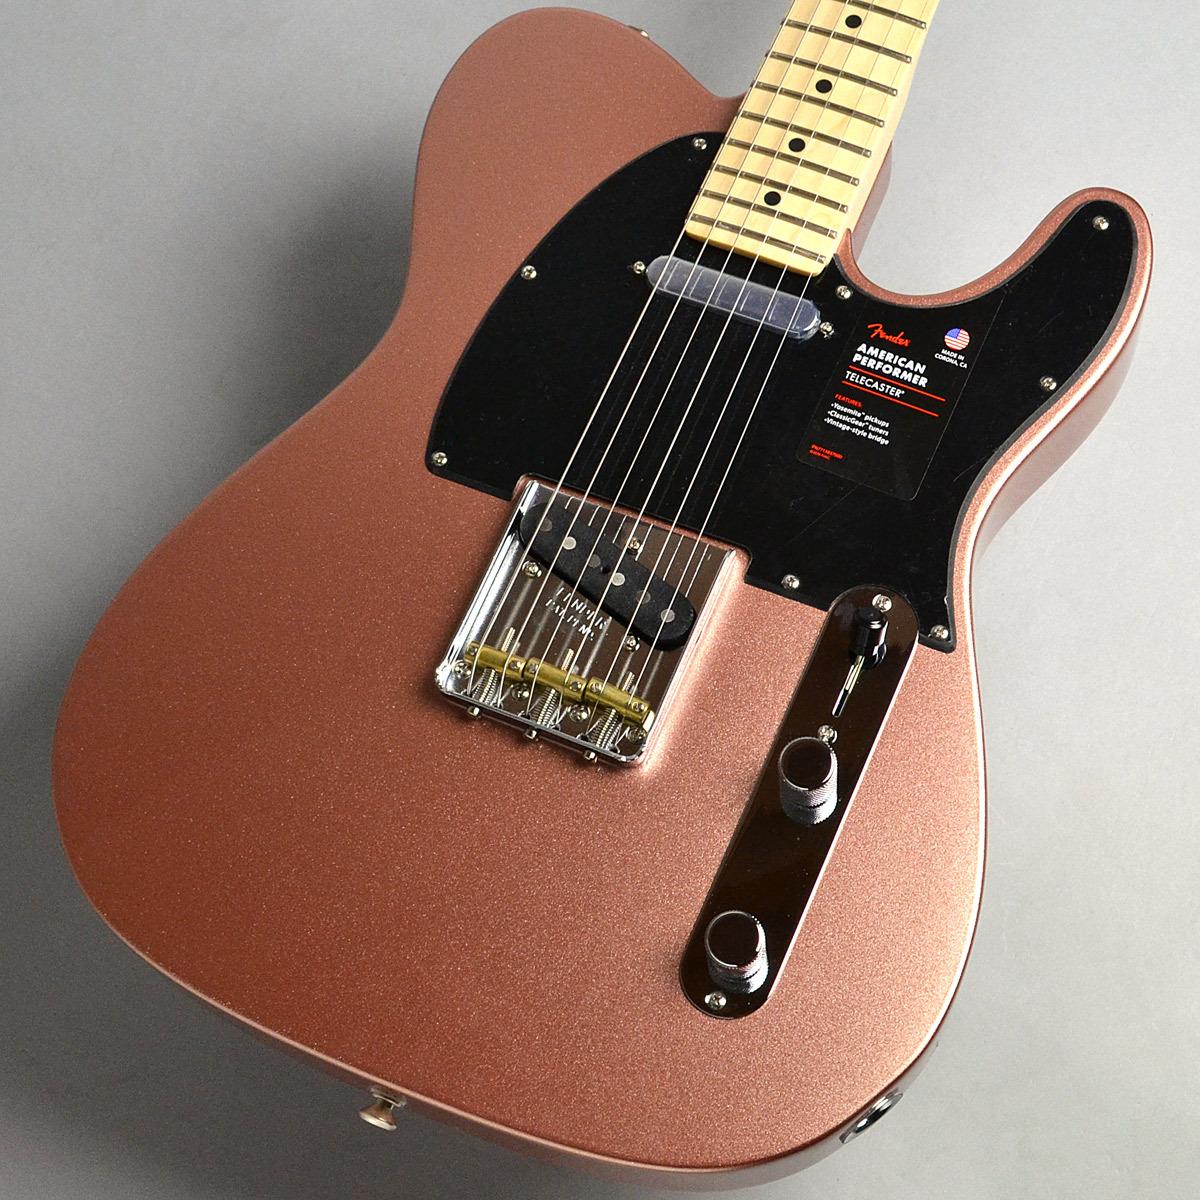 Fender Fender American Telecaster/Penny Performer Telecaster/Penny エレキギター/テレキャスター【フェンダー American】【新宿PePe店】, PORTUS:f6b142b9 --- sunward.msk.ru